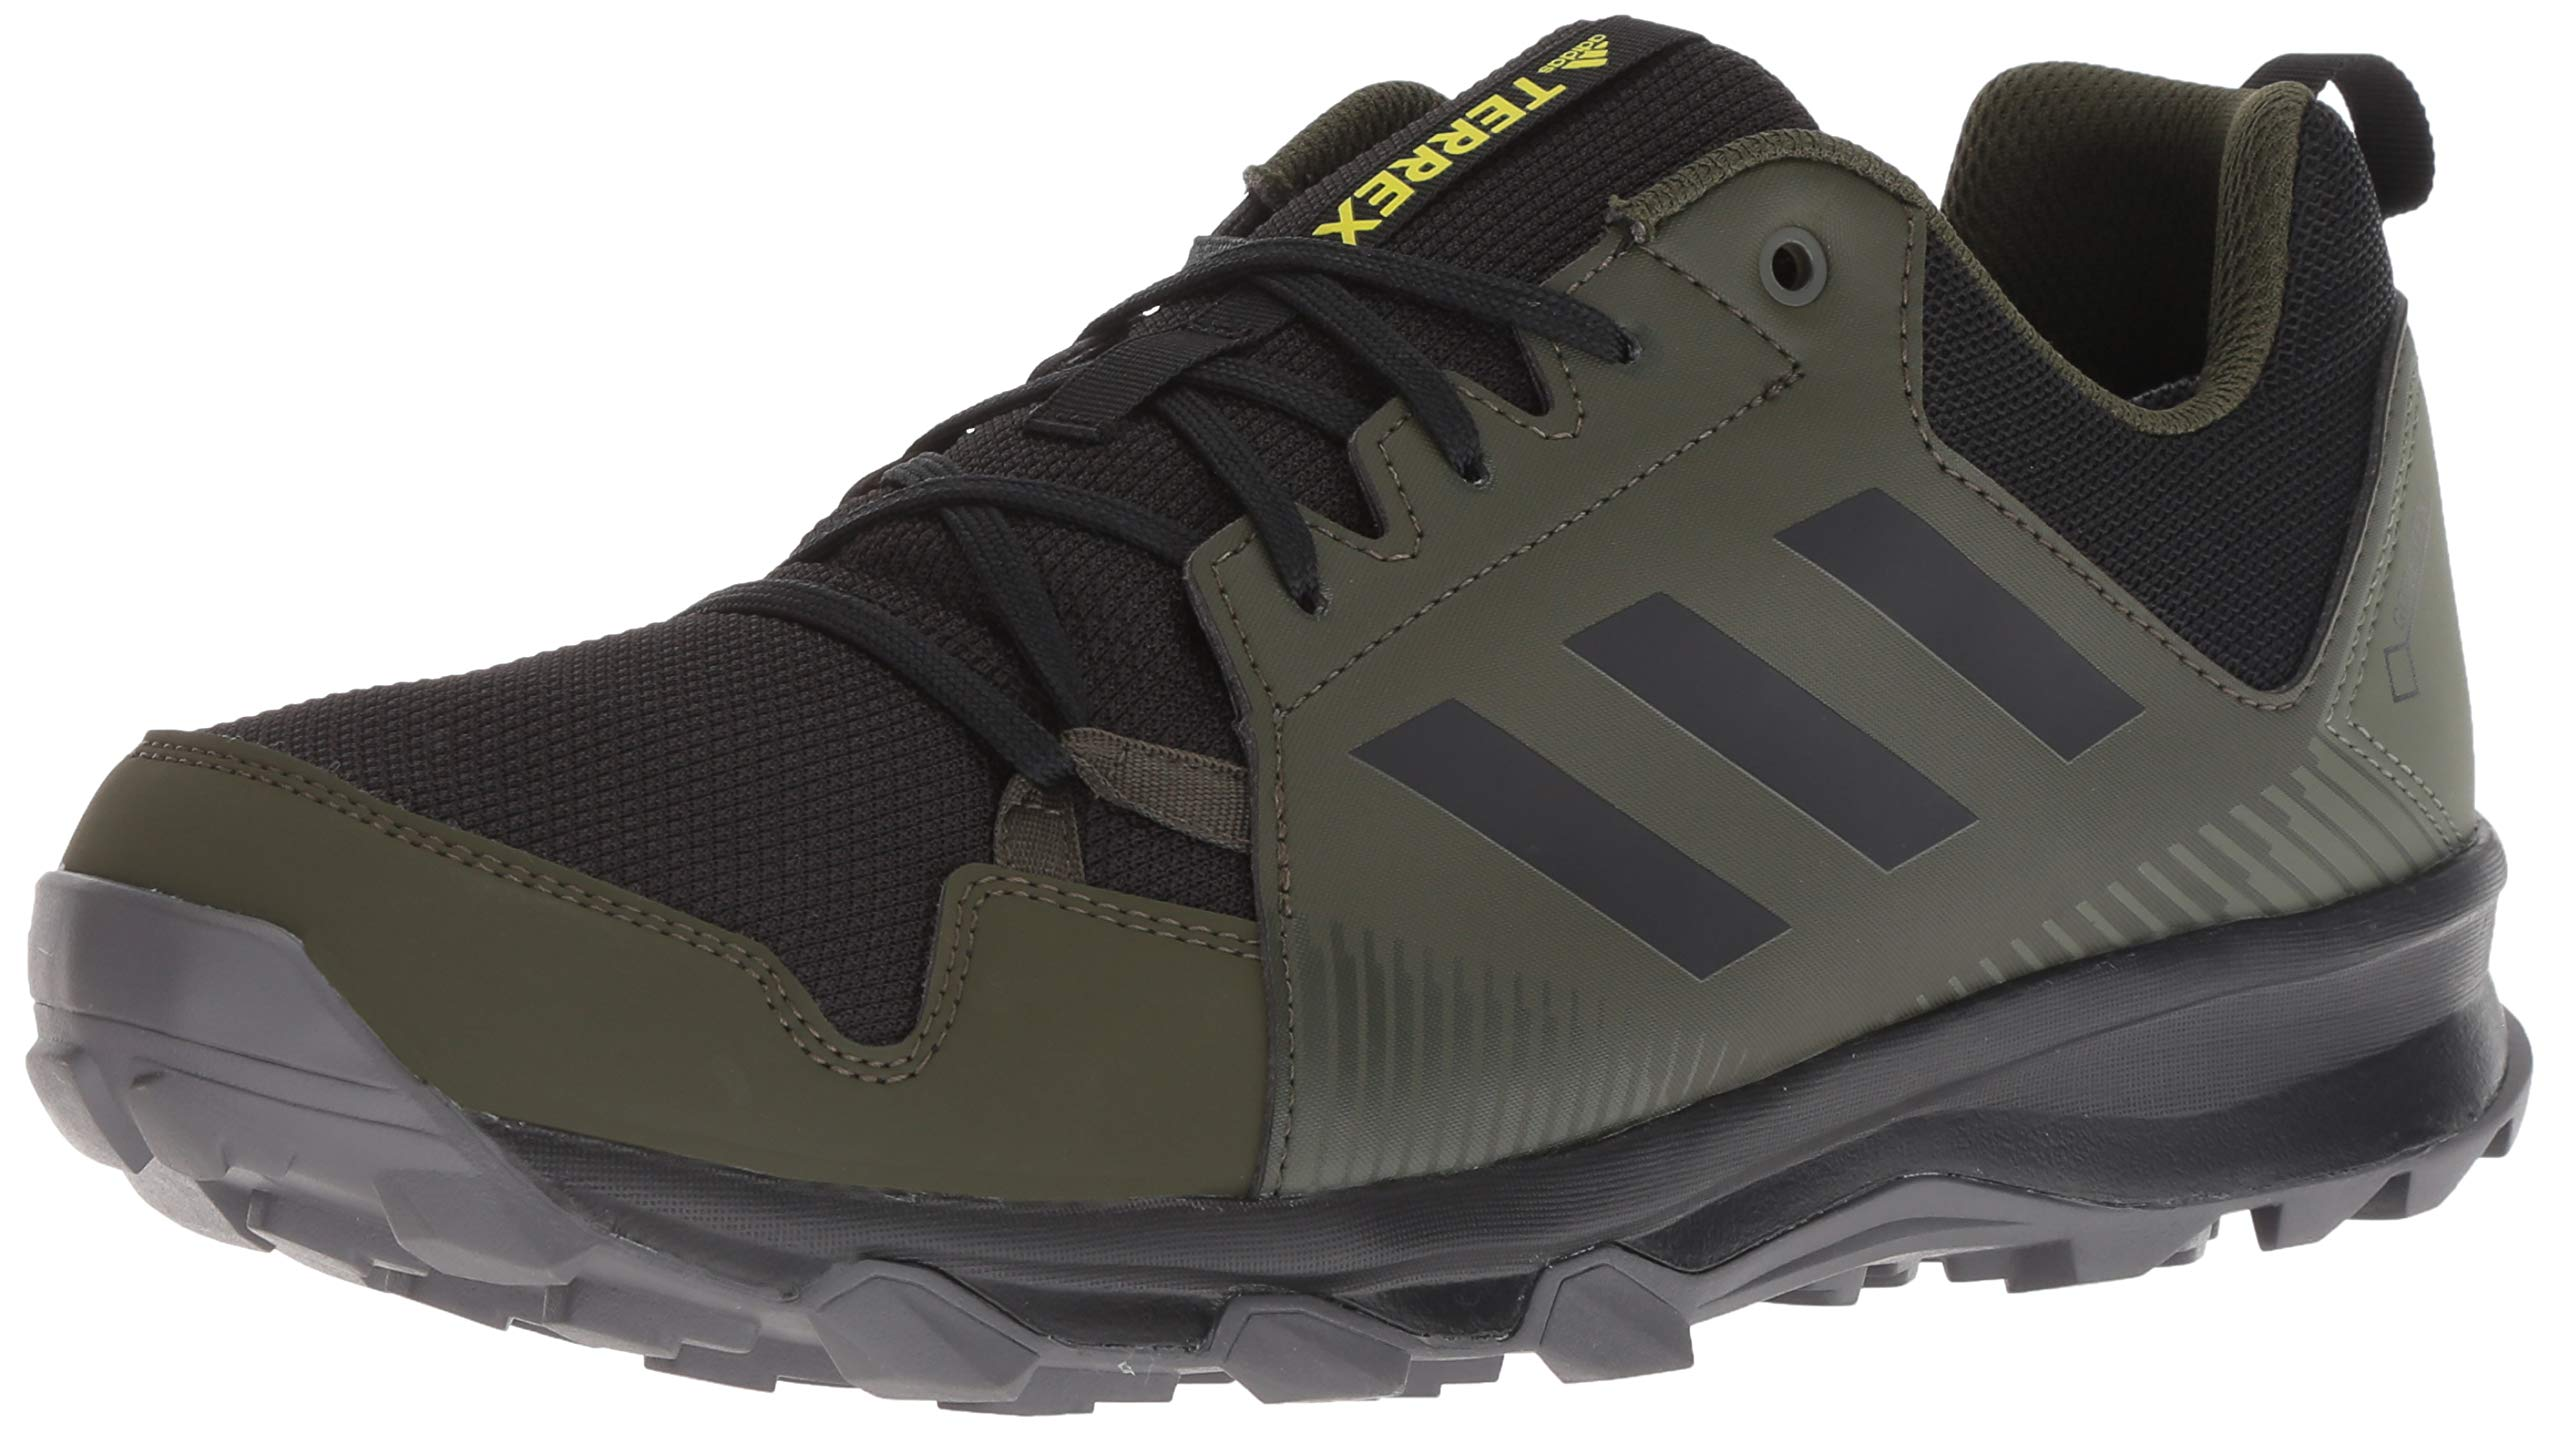 adidas outdoor Men's Terrex Tracerocker GTX, Base Green/Black/Night Cargo, 8.5 D US